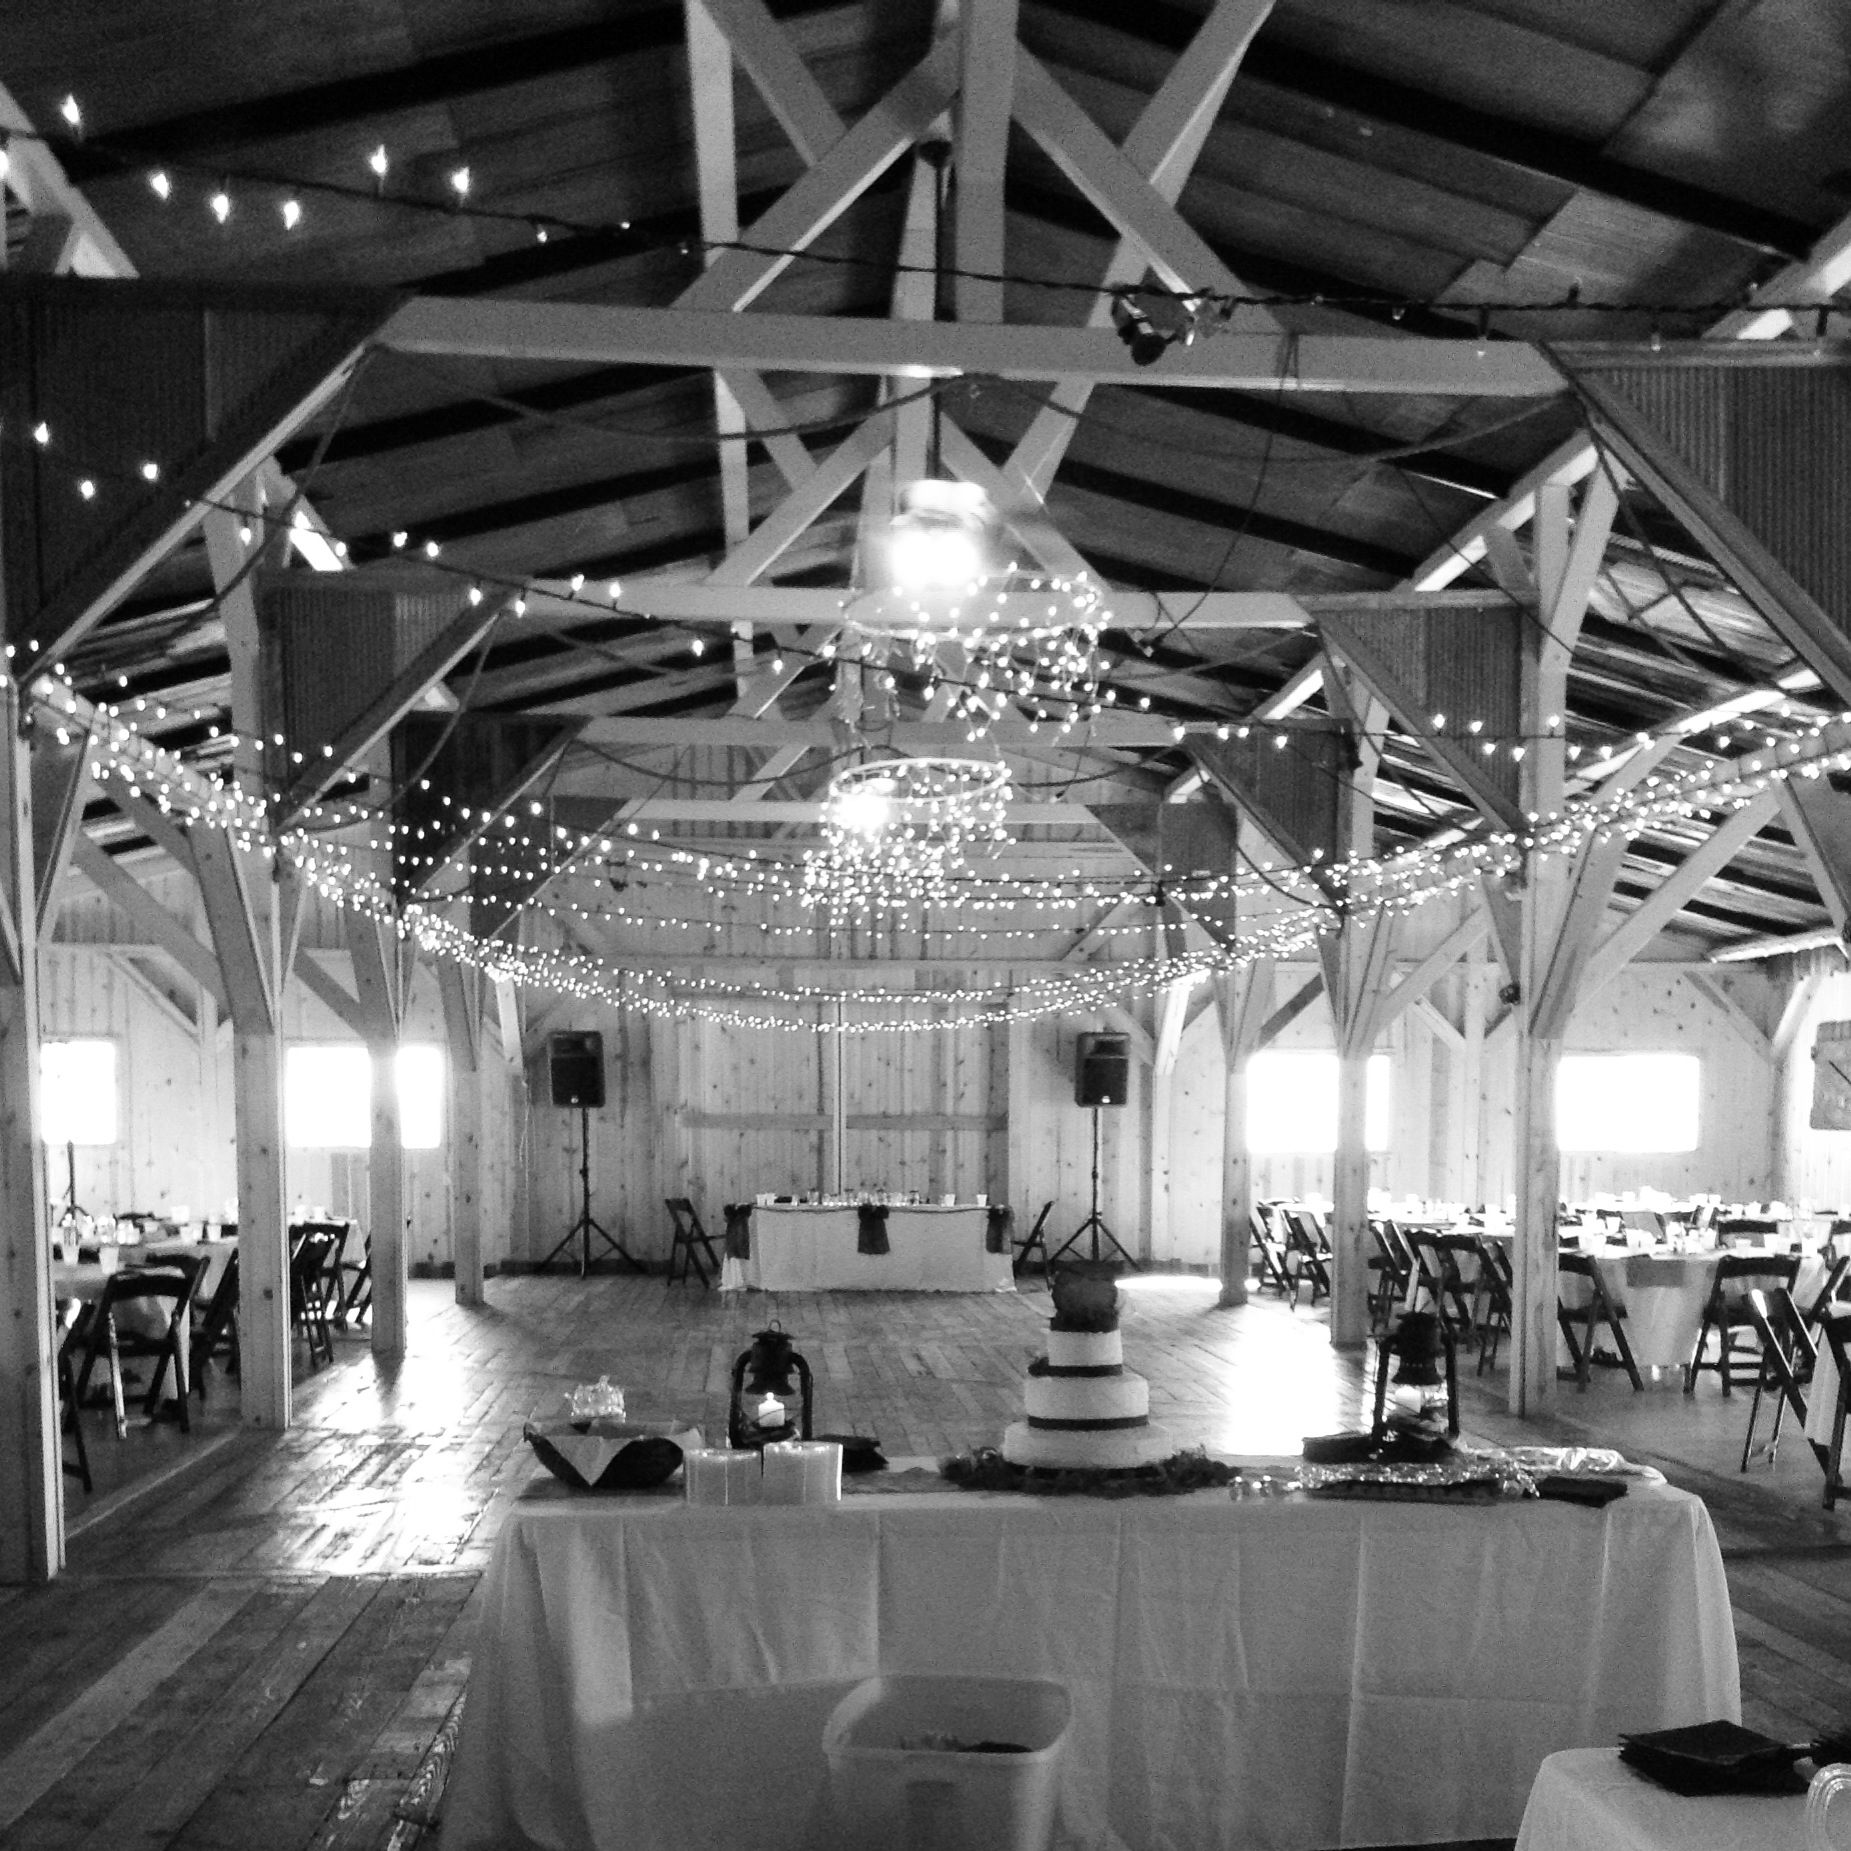 Pin Barn Wedding Venues In Huntsville Al Decksscom Cake On Pinterest